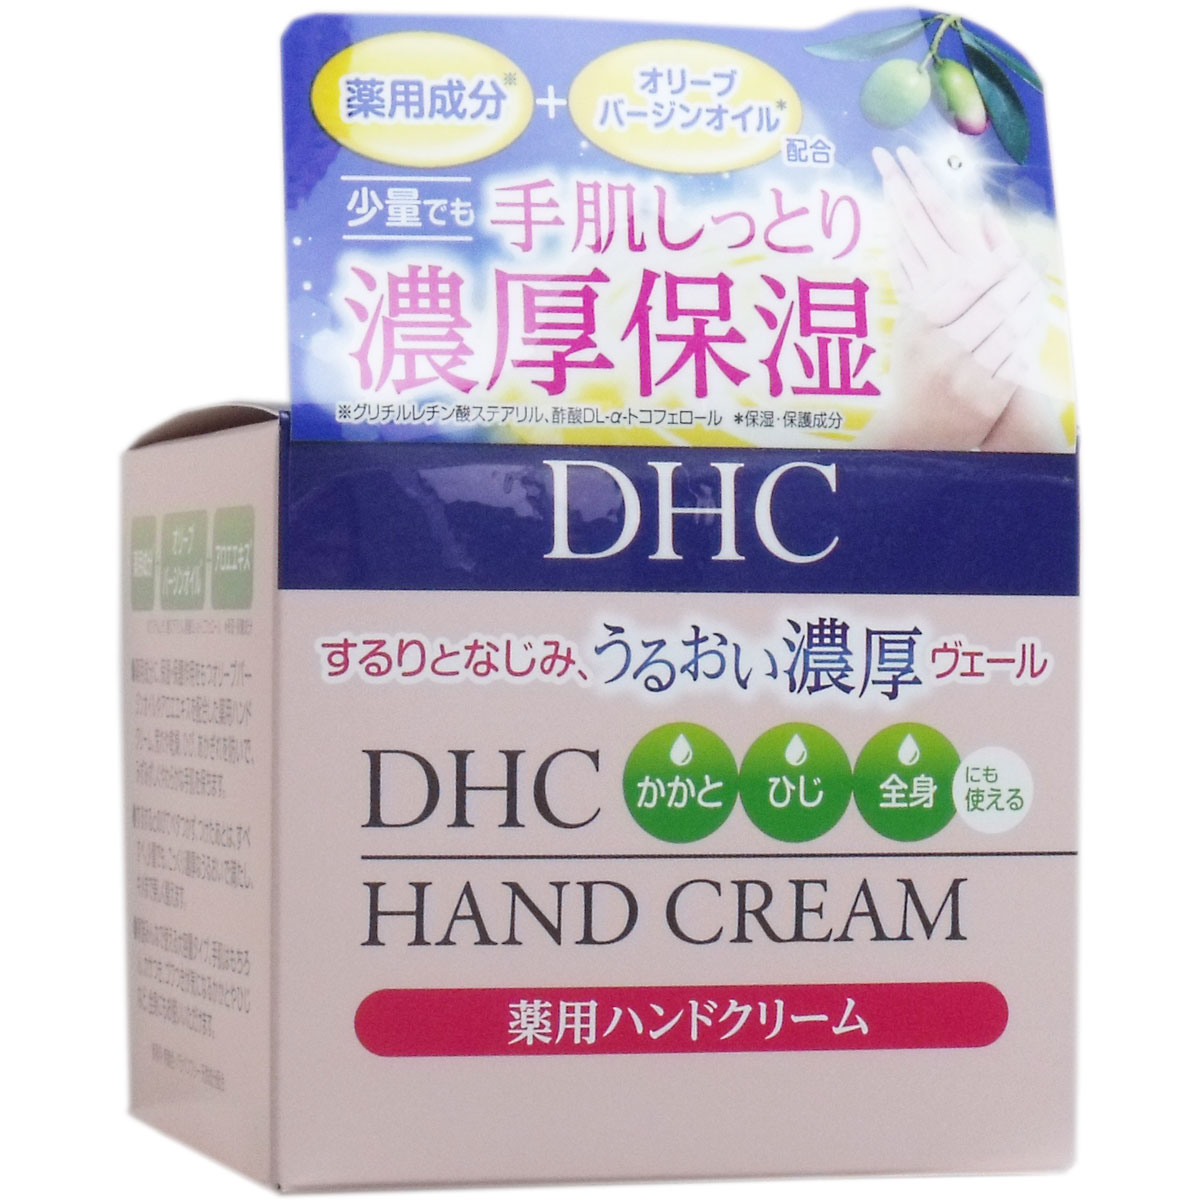 DHC 薬用 ハンドクリーム 120g